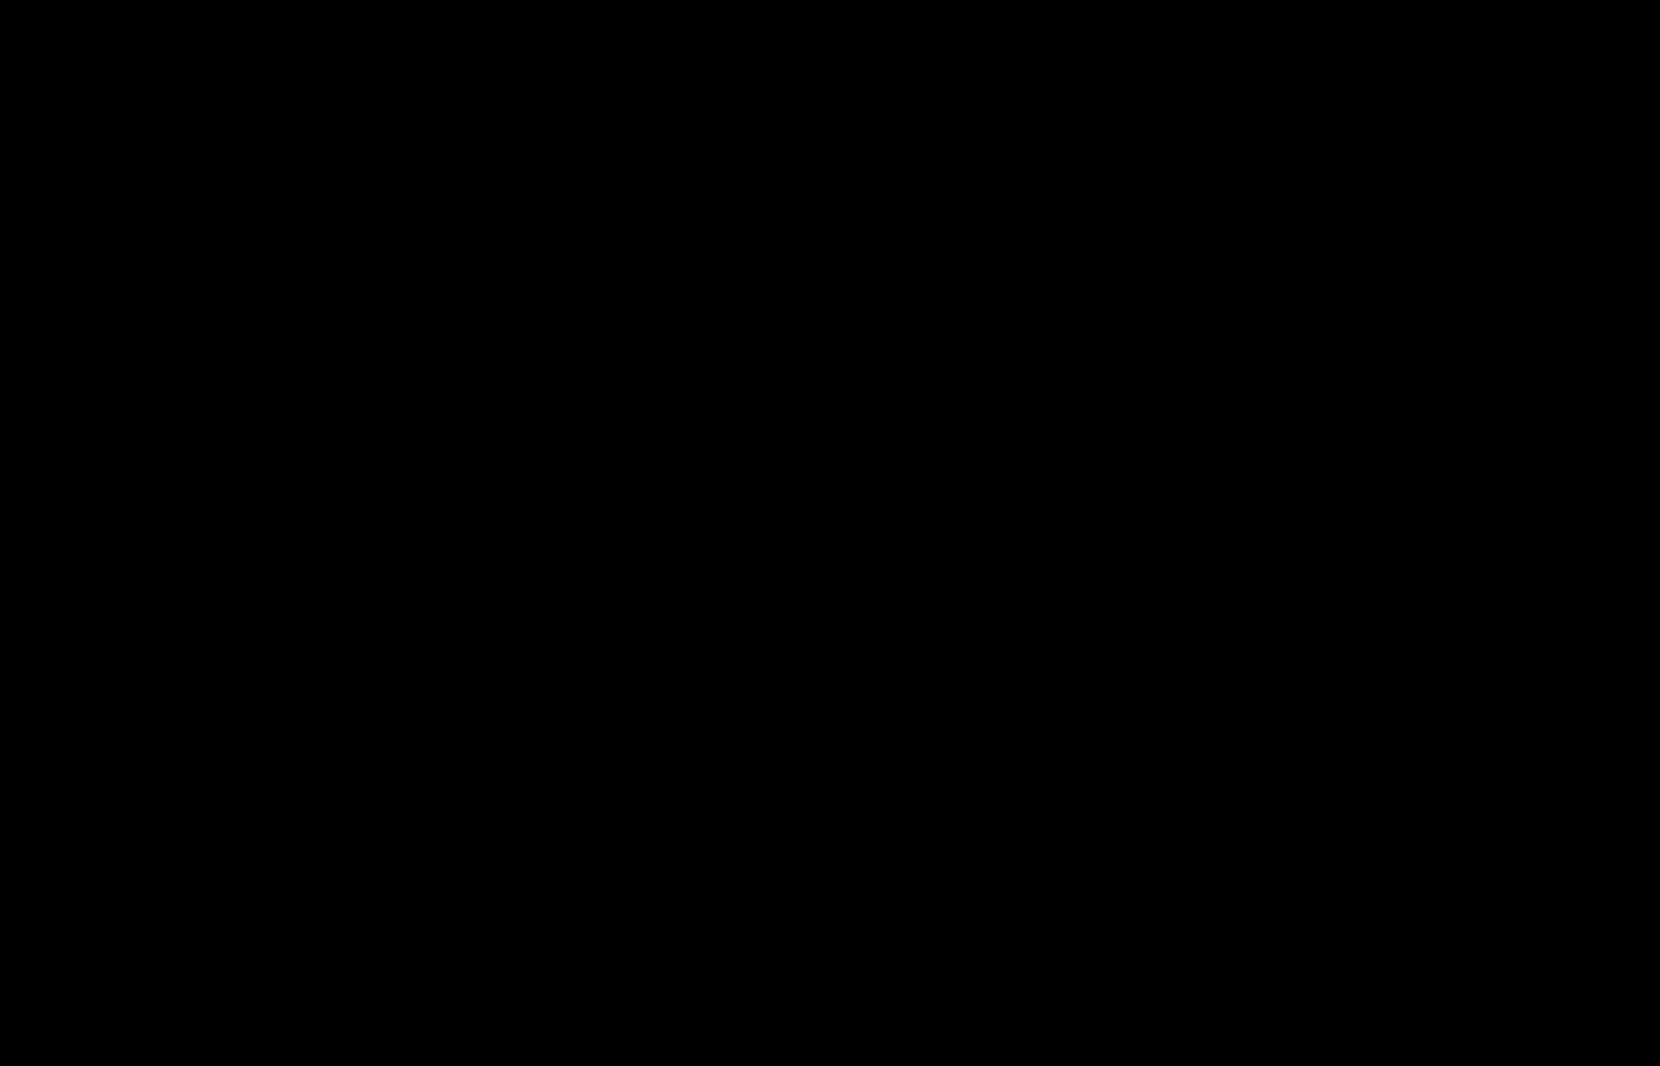 hummel sport & leisure Warenhandelsges. GmbH